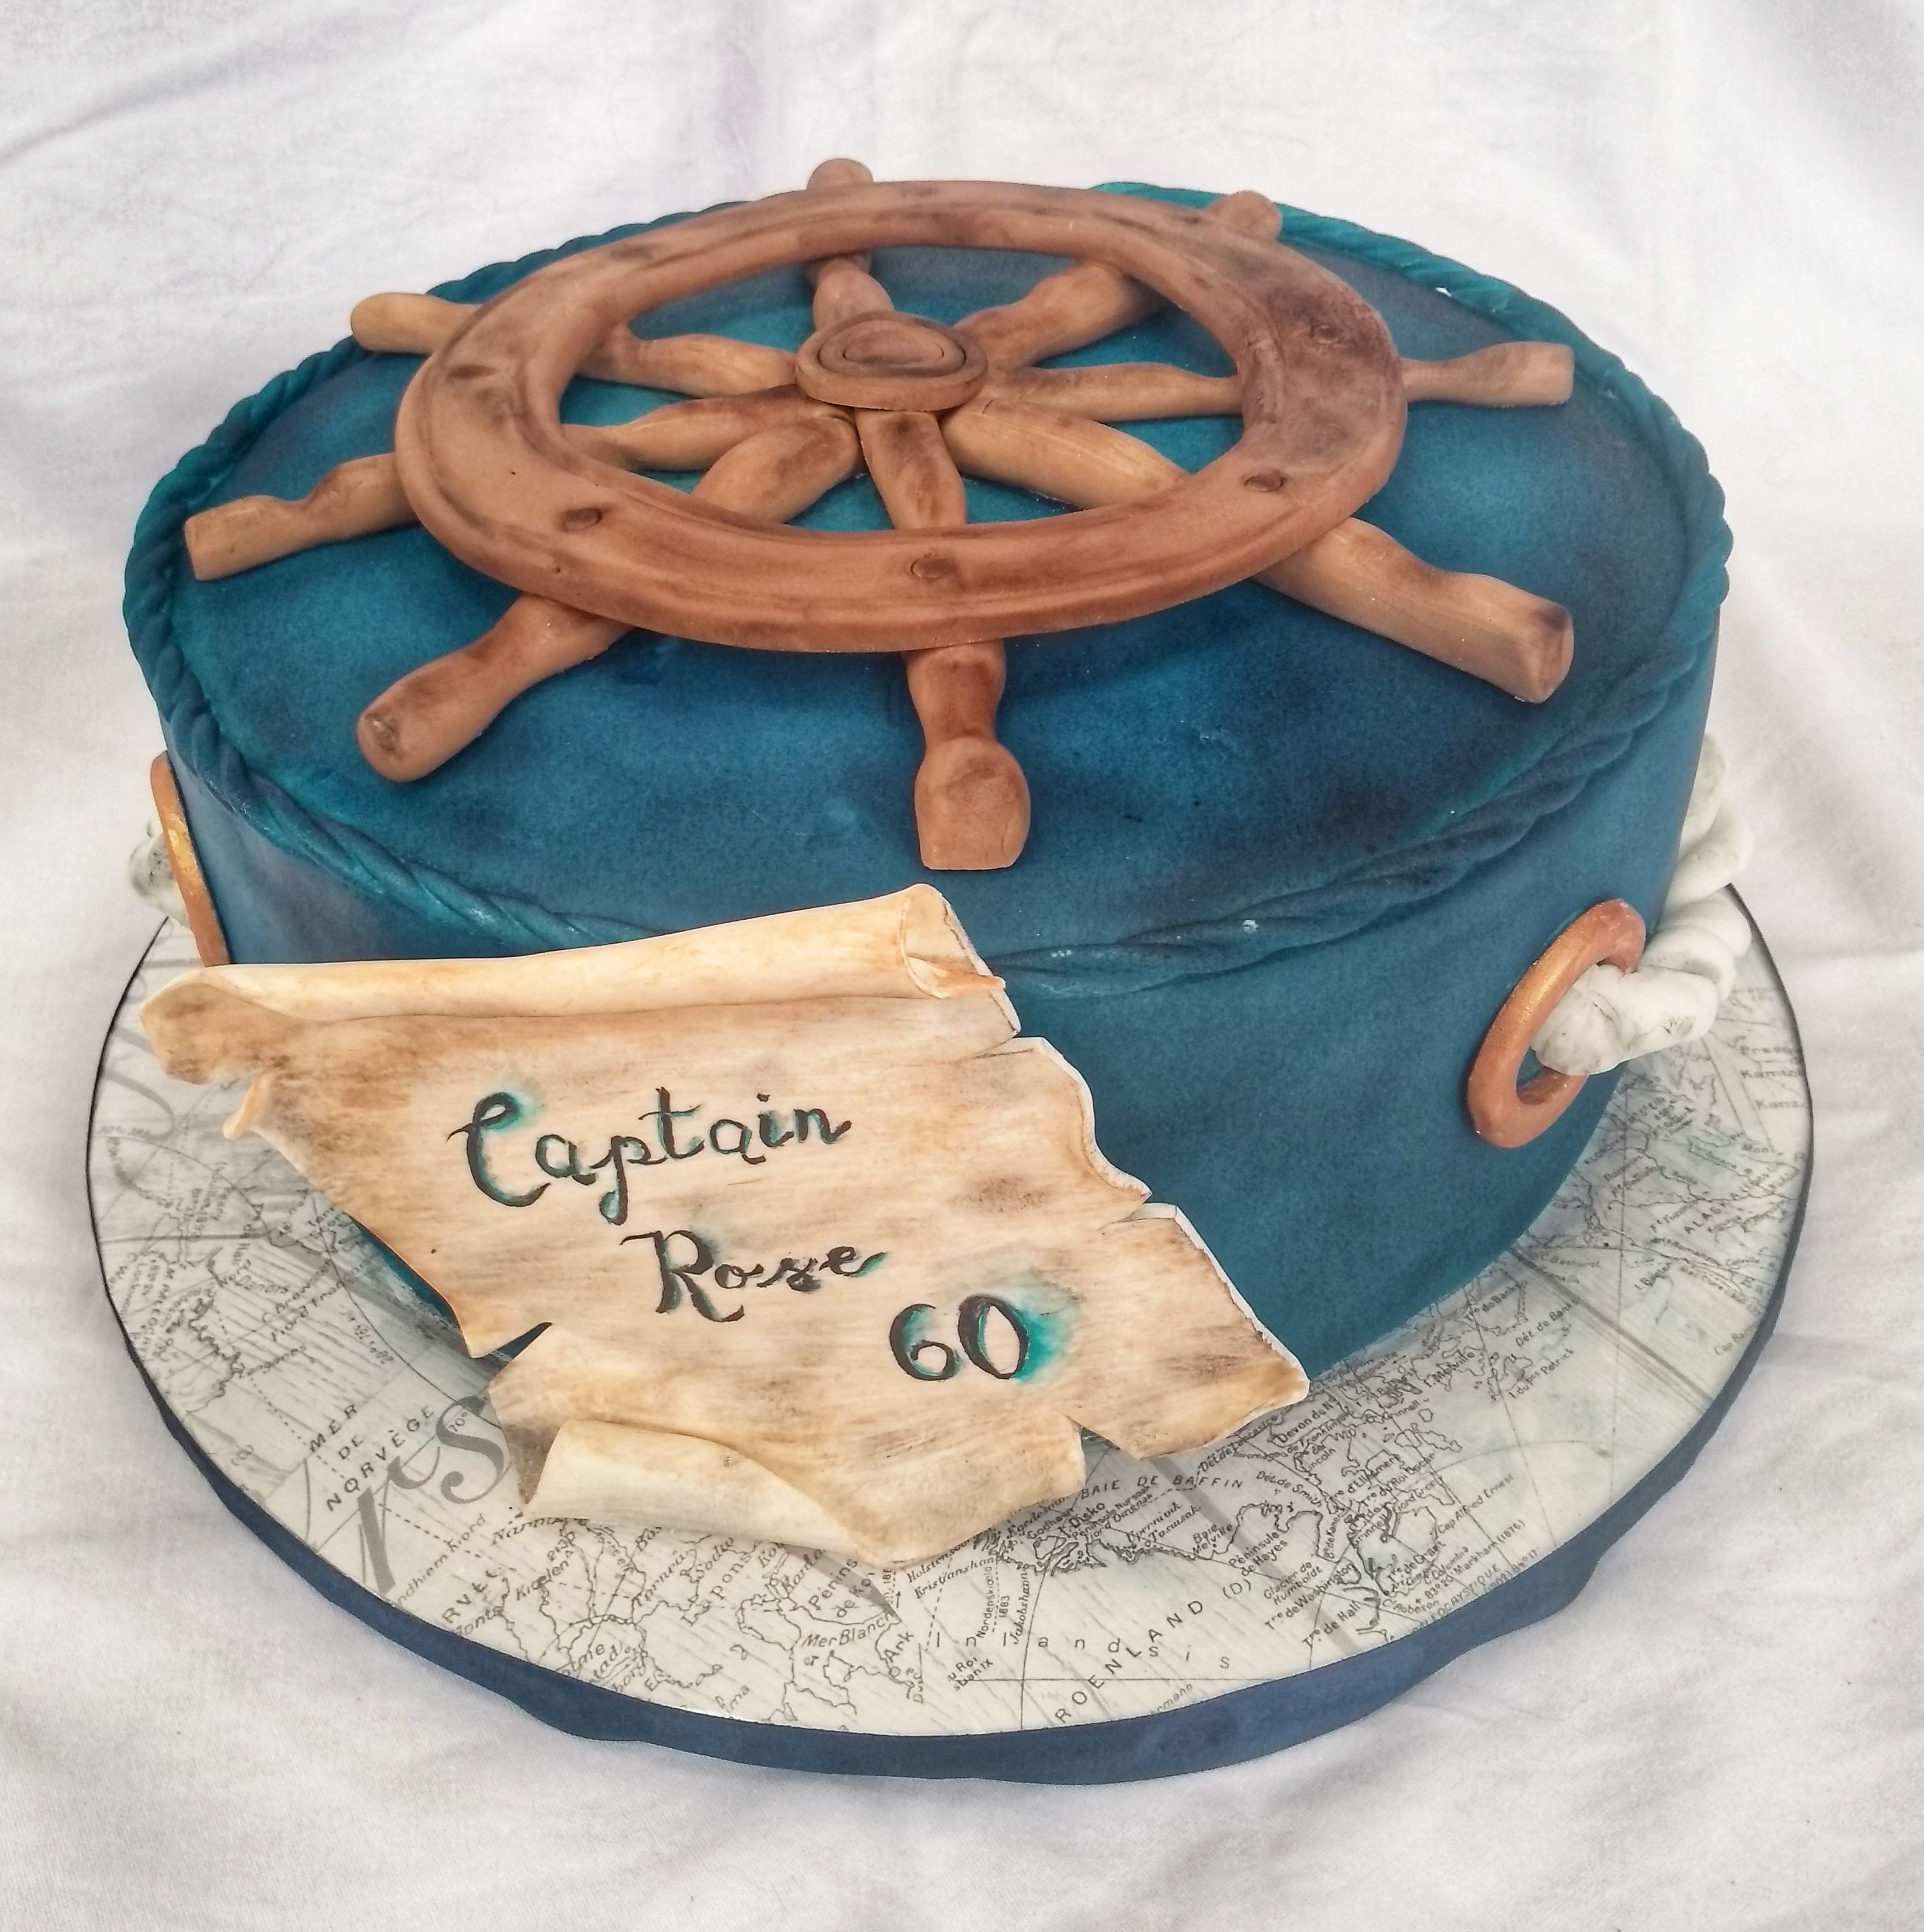 Nautical themed 60th birthday cake